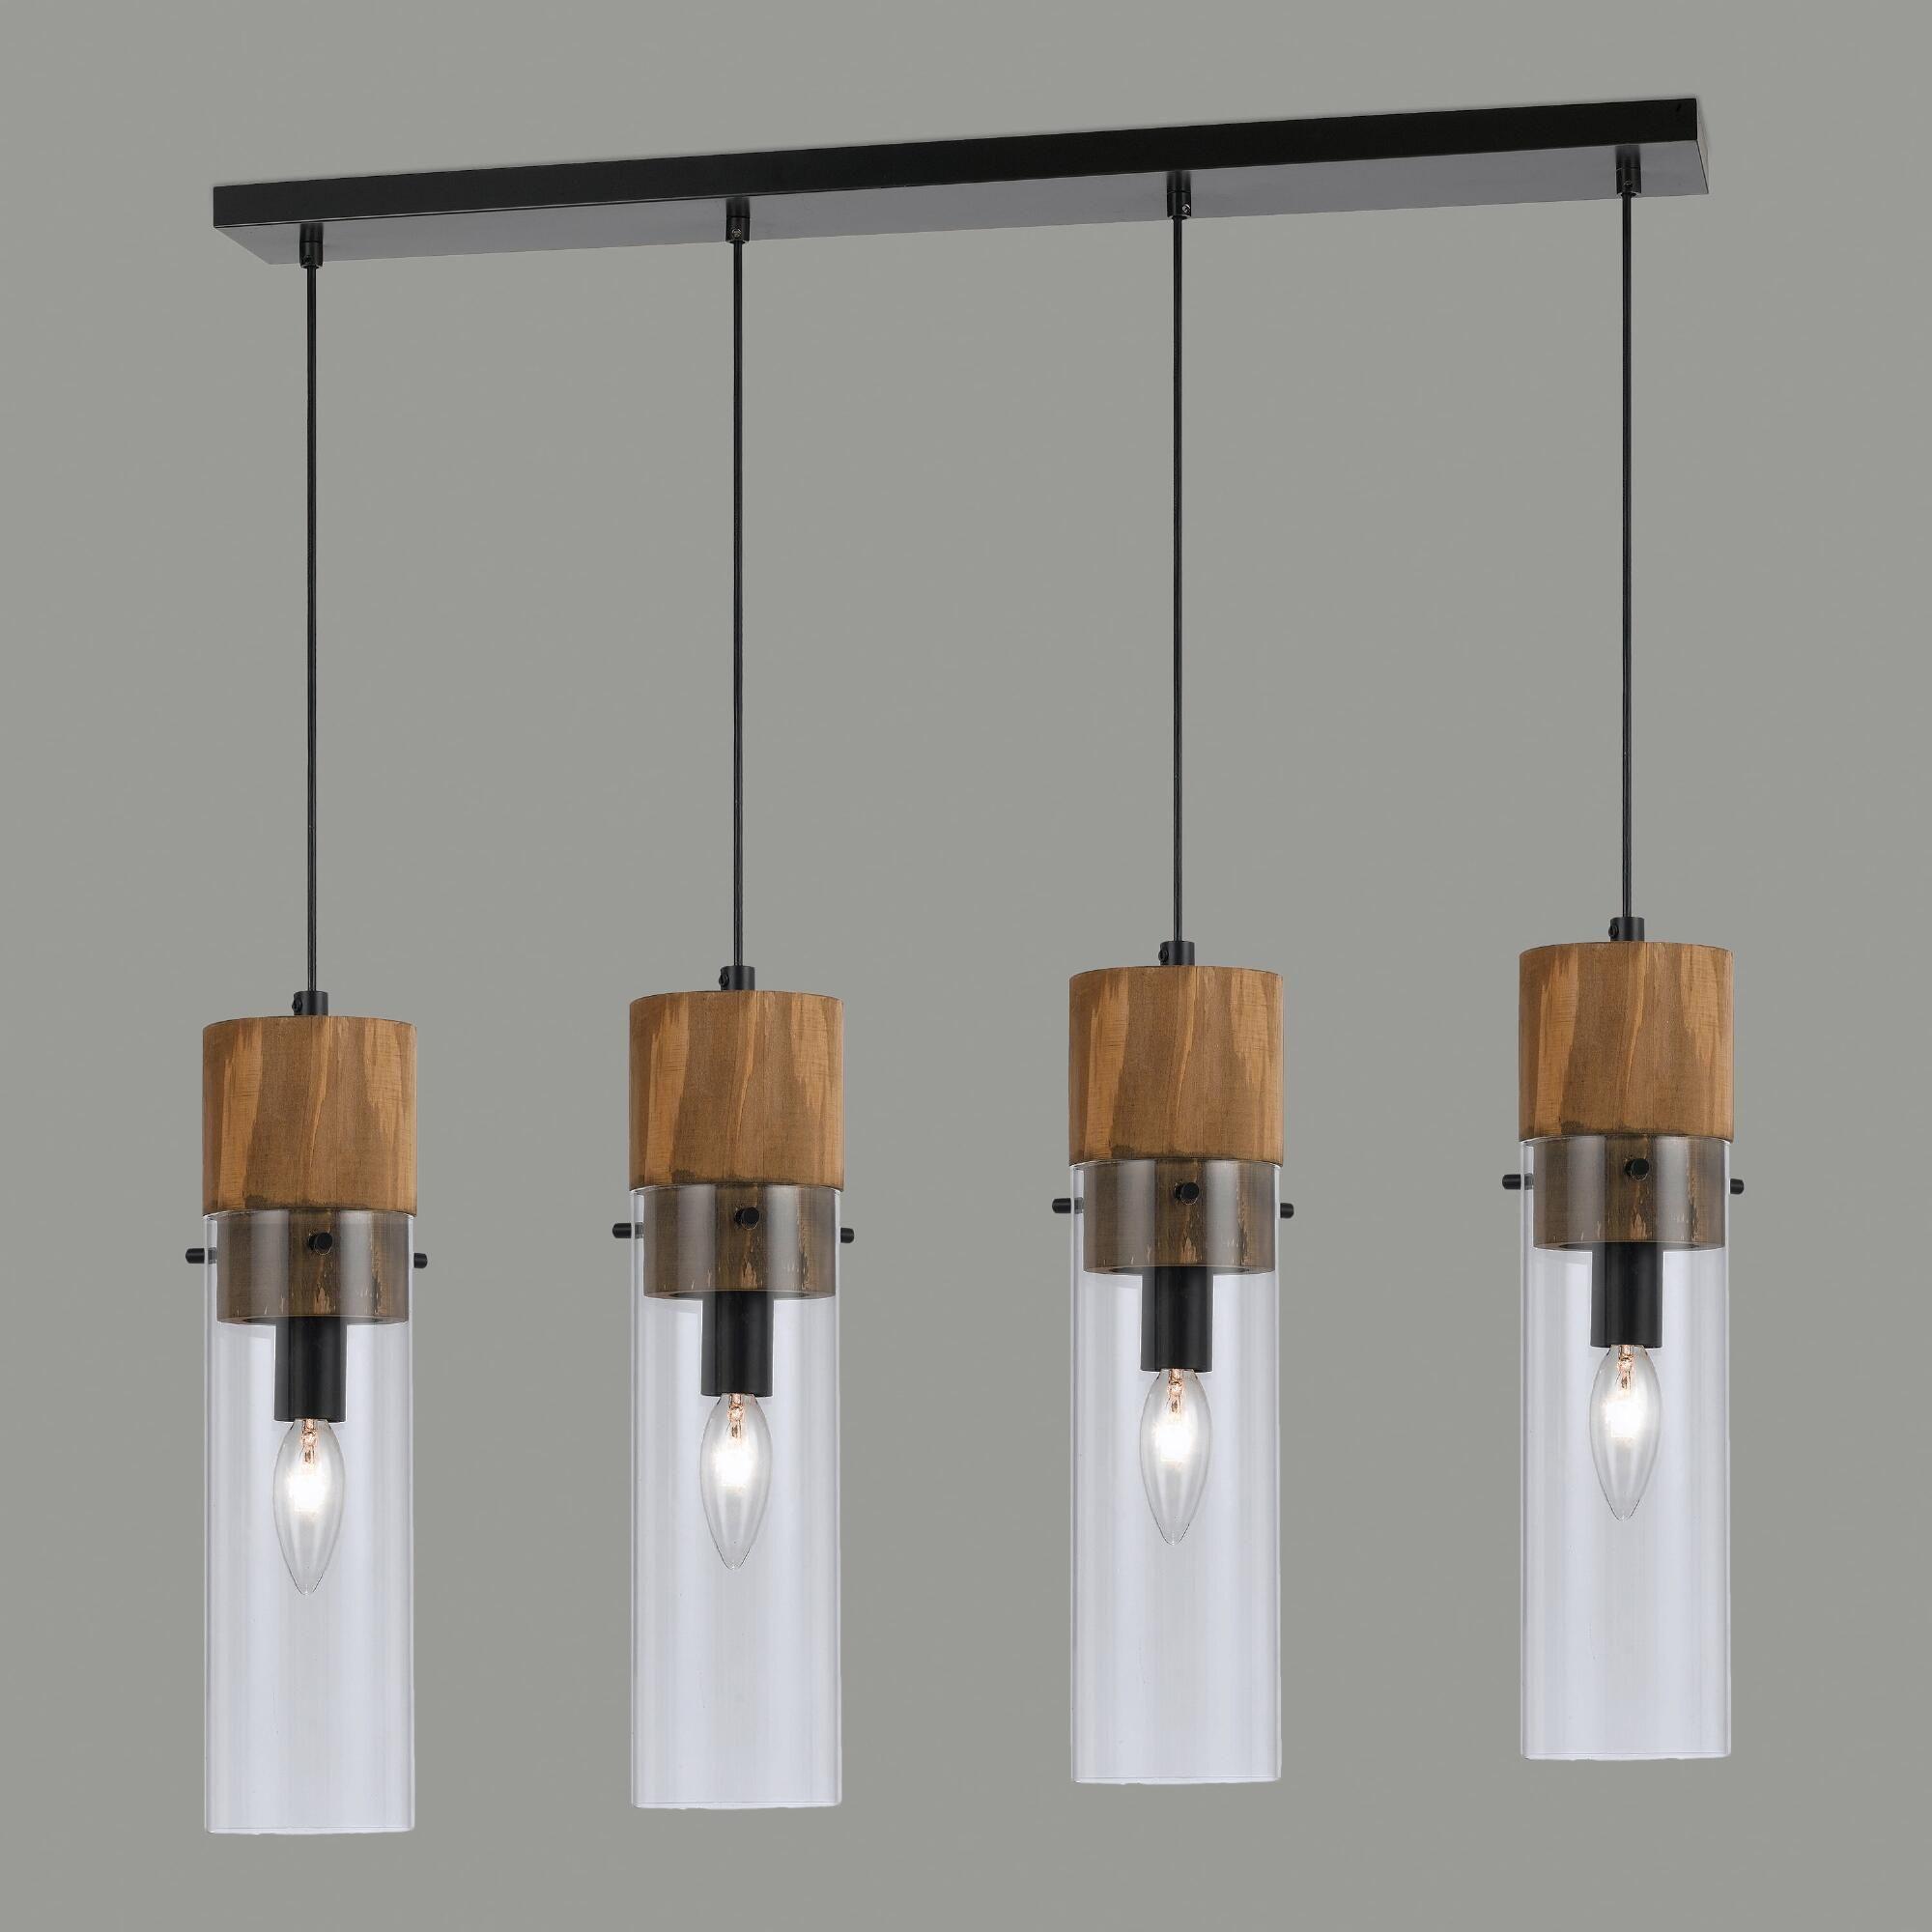 Wood And Glass 4 Light Pendant Lamp Wood Light Fixture Pendant